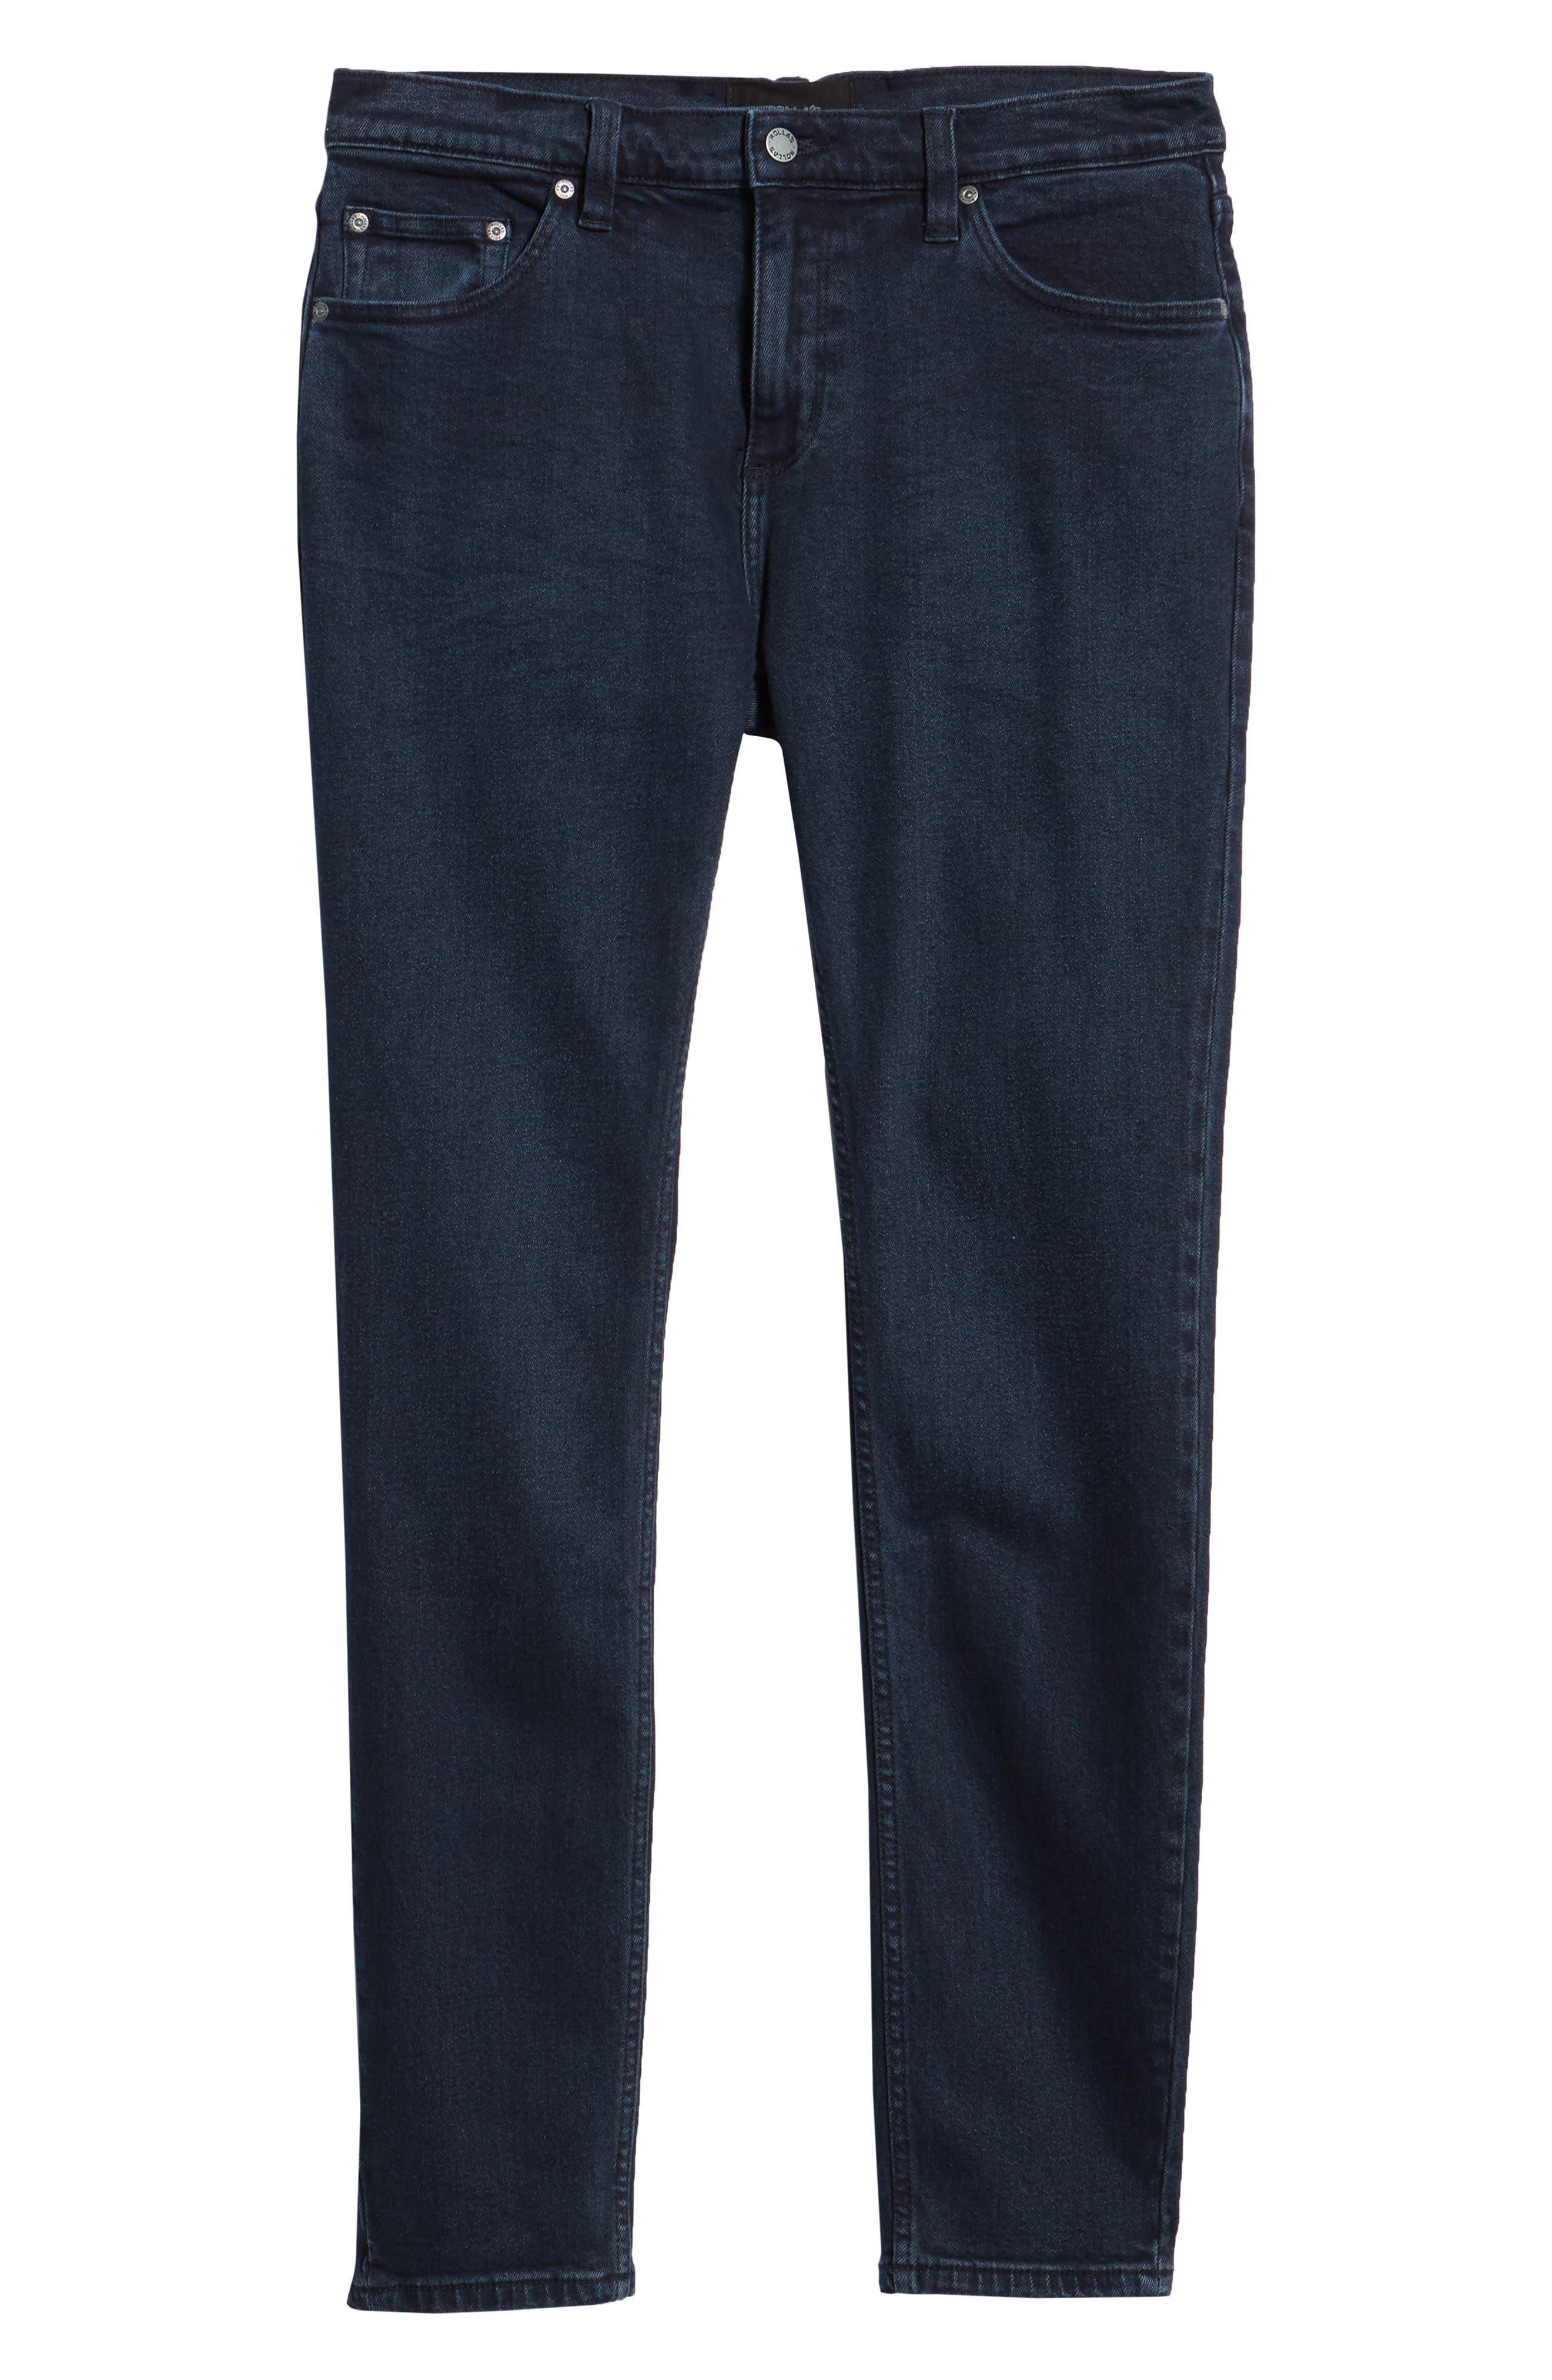 Stinger Skinny Fit Jeans,                             Alternate thumbnail 6, color,                             STONE FREE BLUE